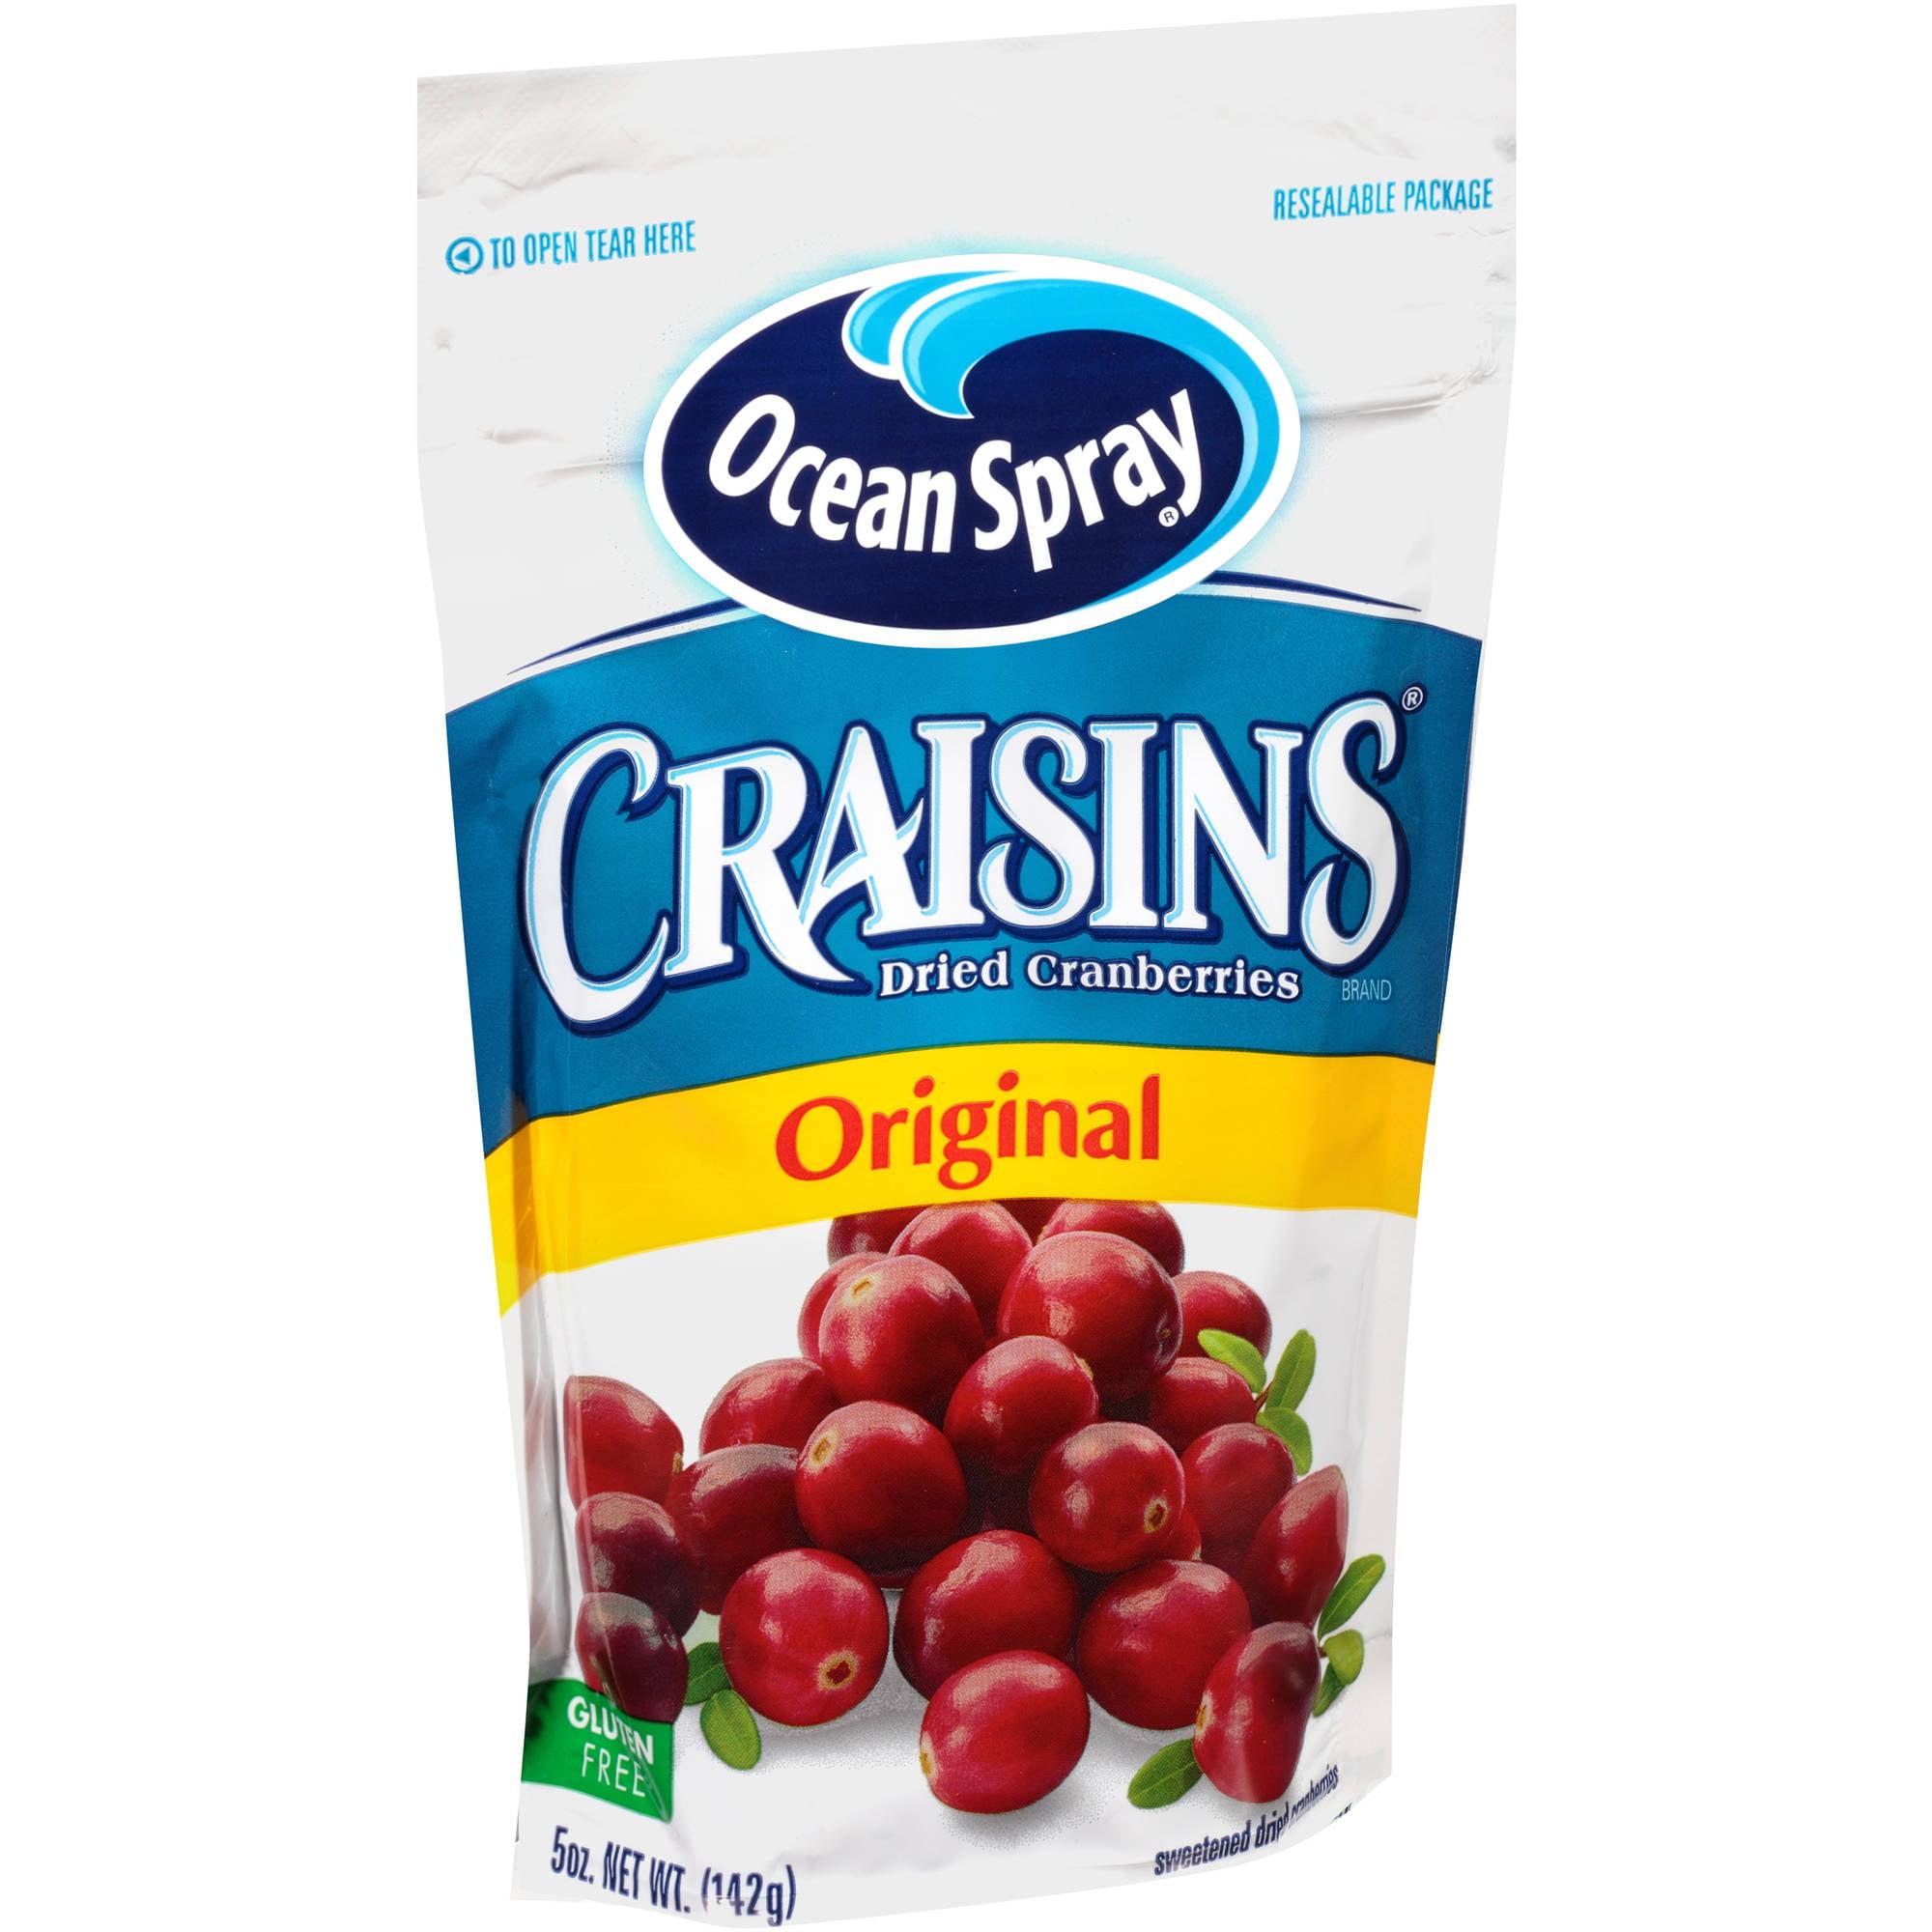 Craisins Original Dried Cranberries, 5 oz